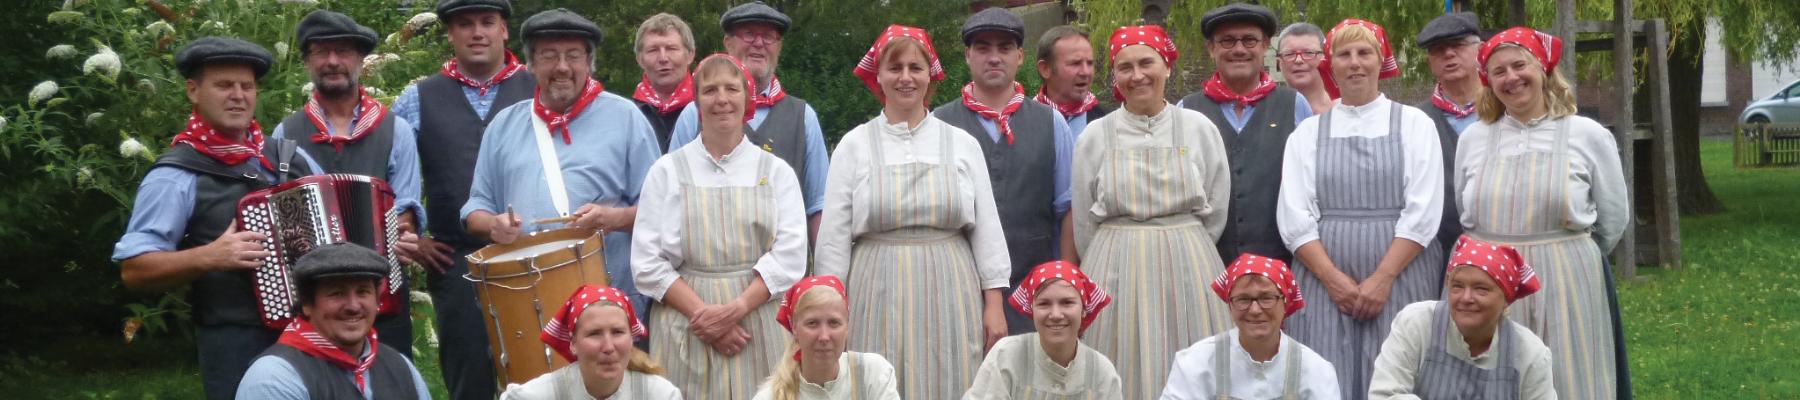 Volkskunstgroep Scarminkel